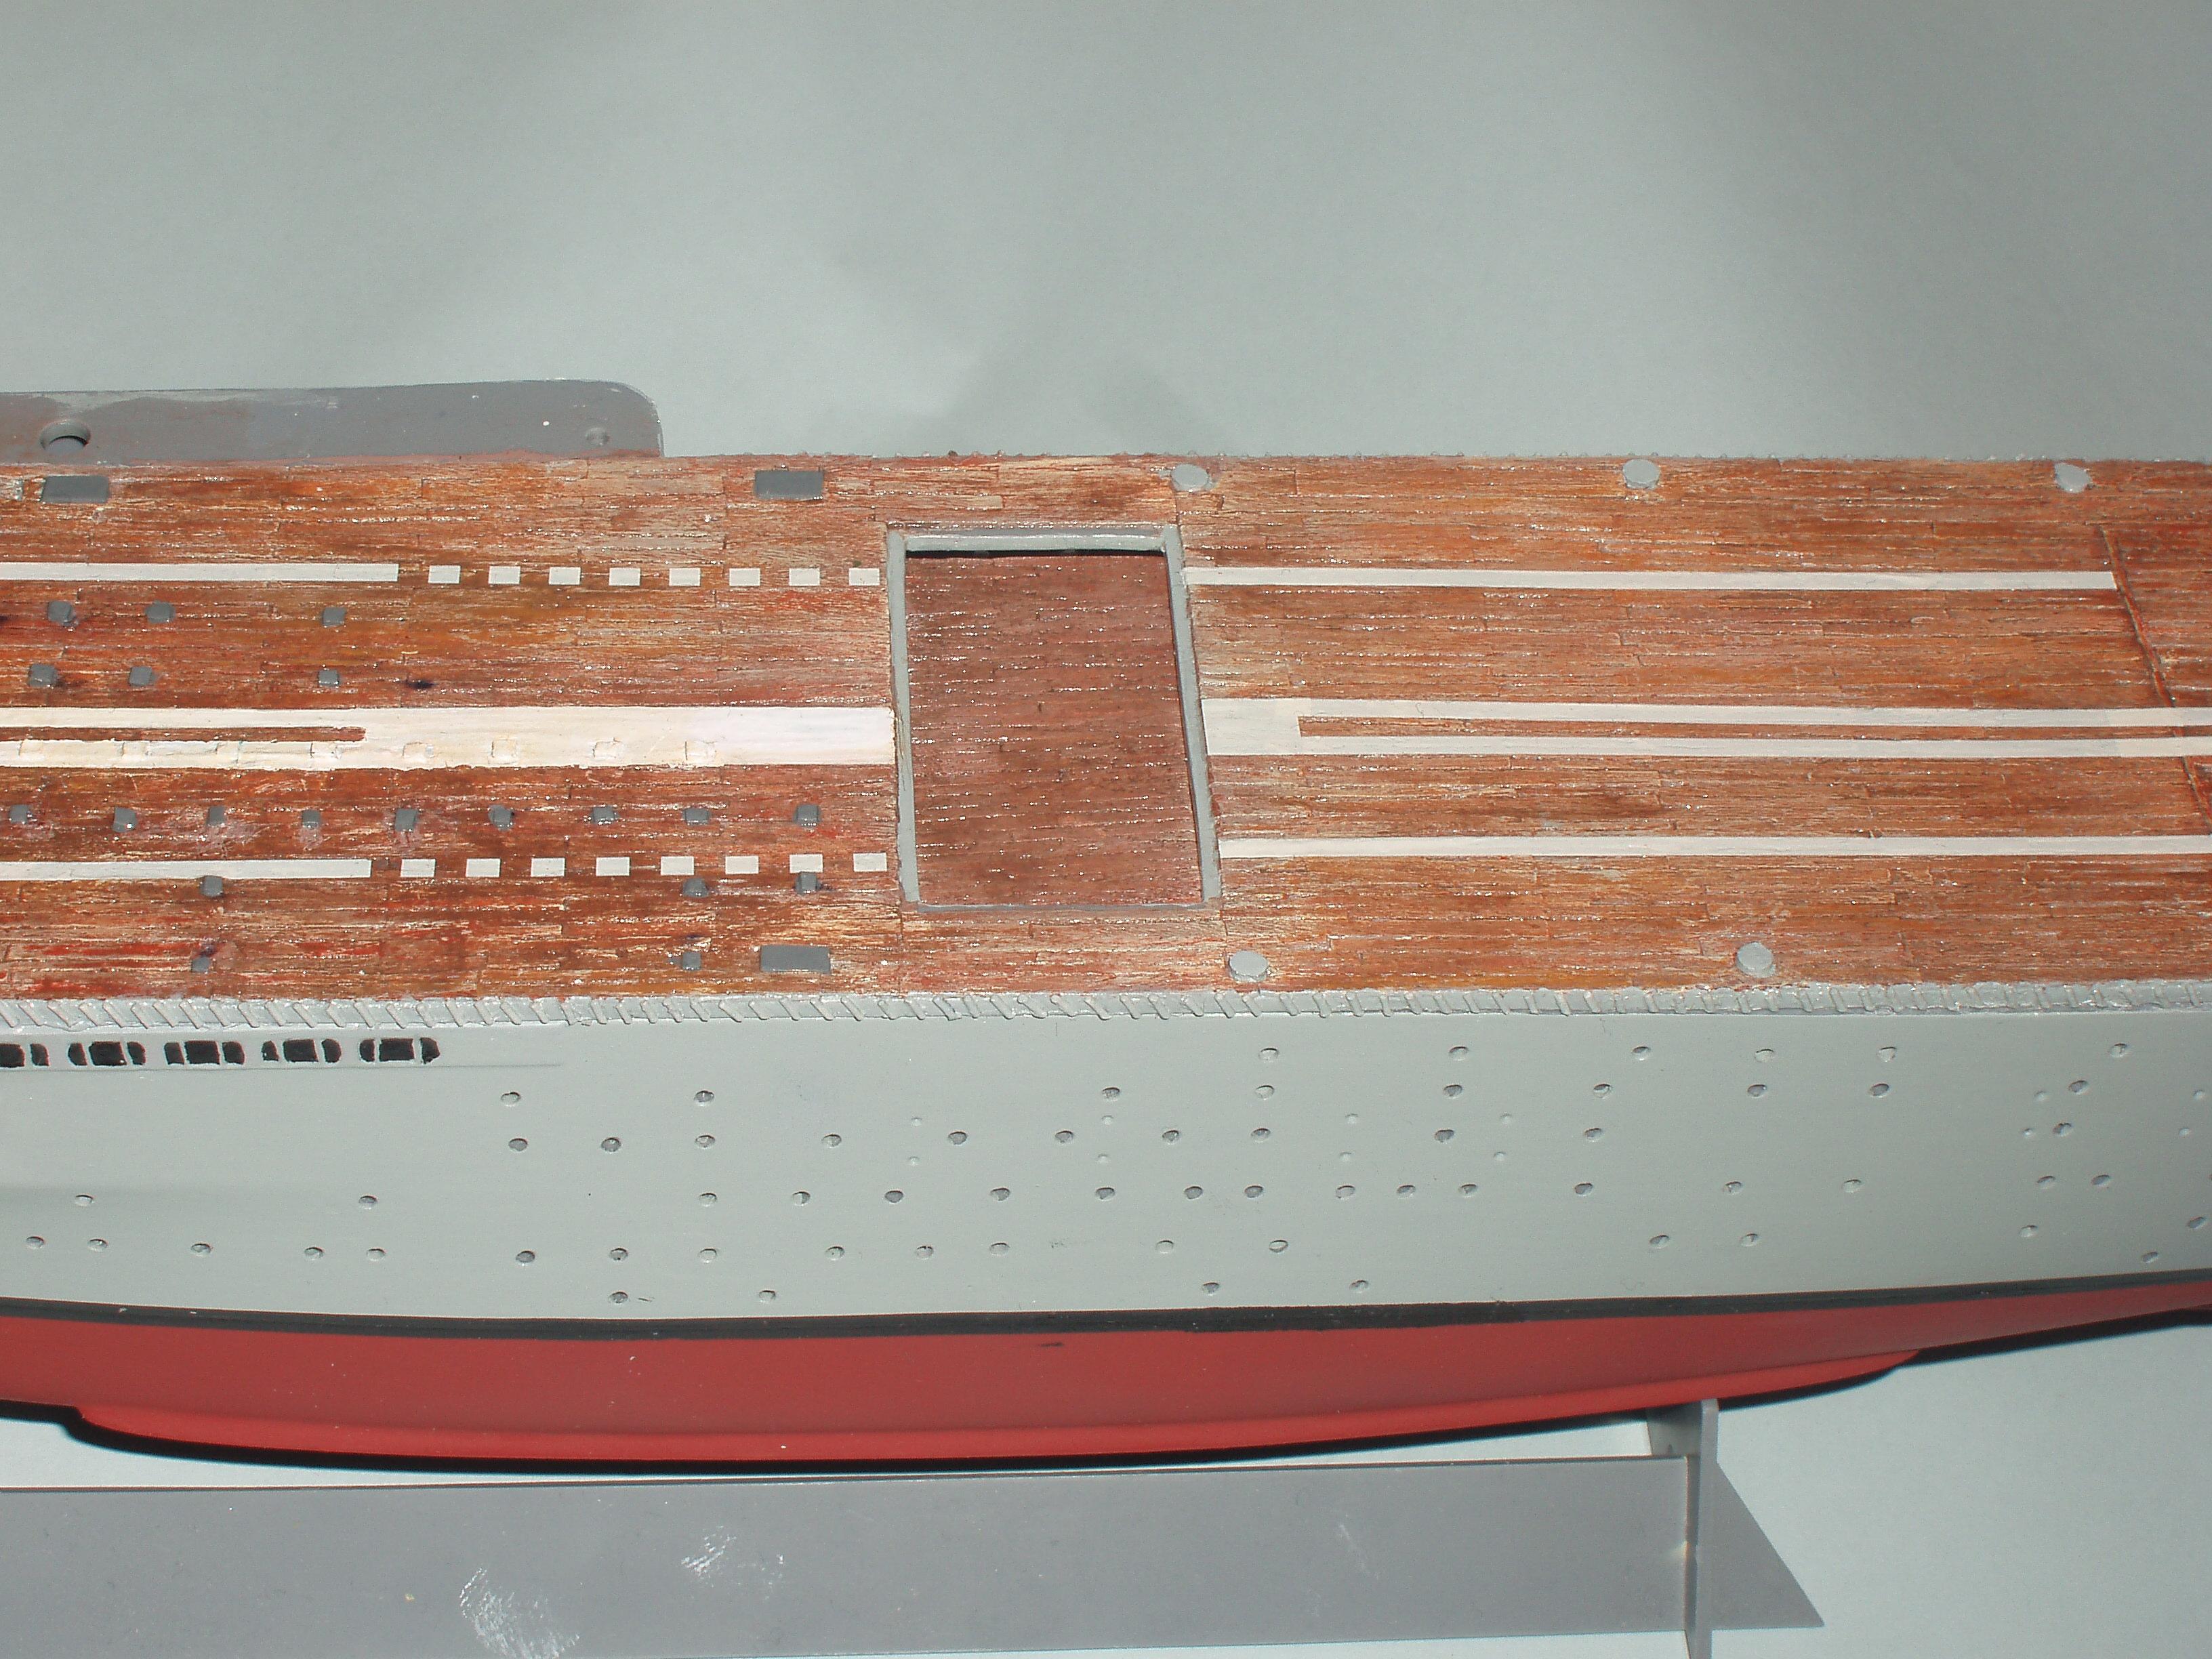 Le porte avions BEARN de l' ARSENAL 991837dio004